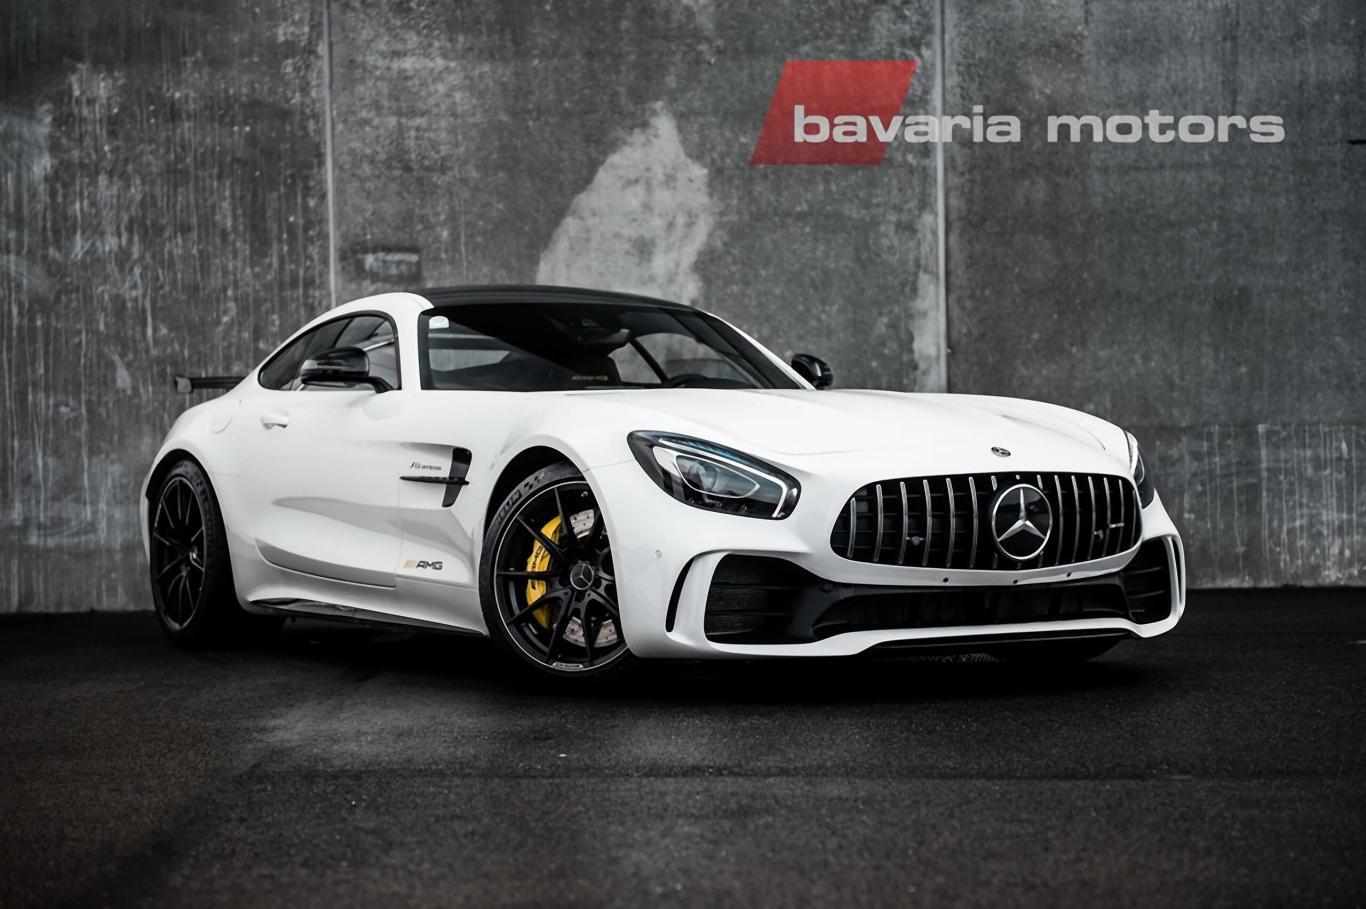 Mercedes Benz Amg >> Mercedes Benz Amg Gt Gtr 585pk 1st Owner 10600kms